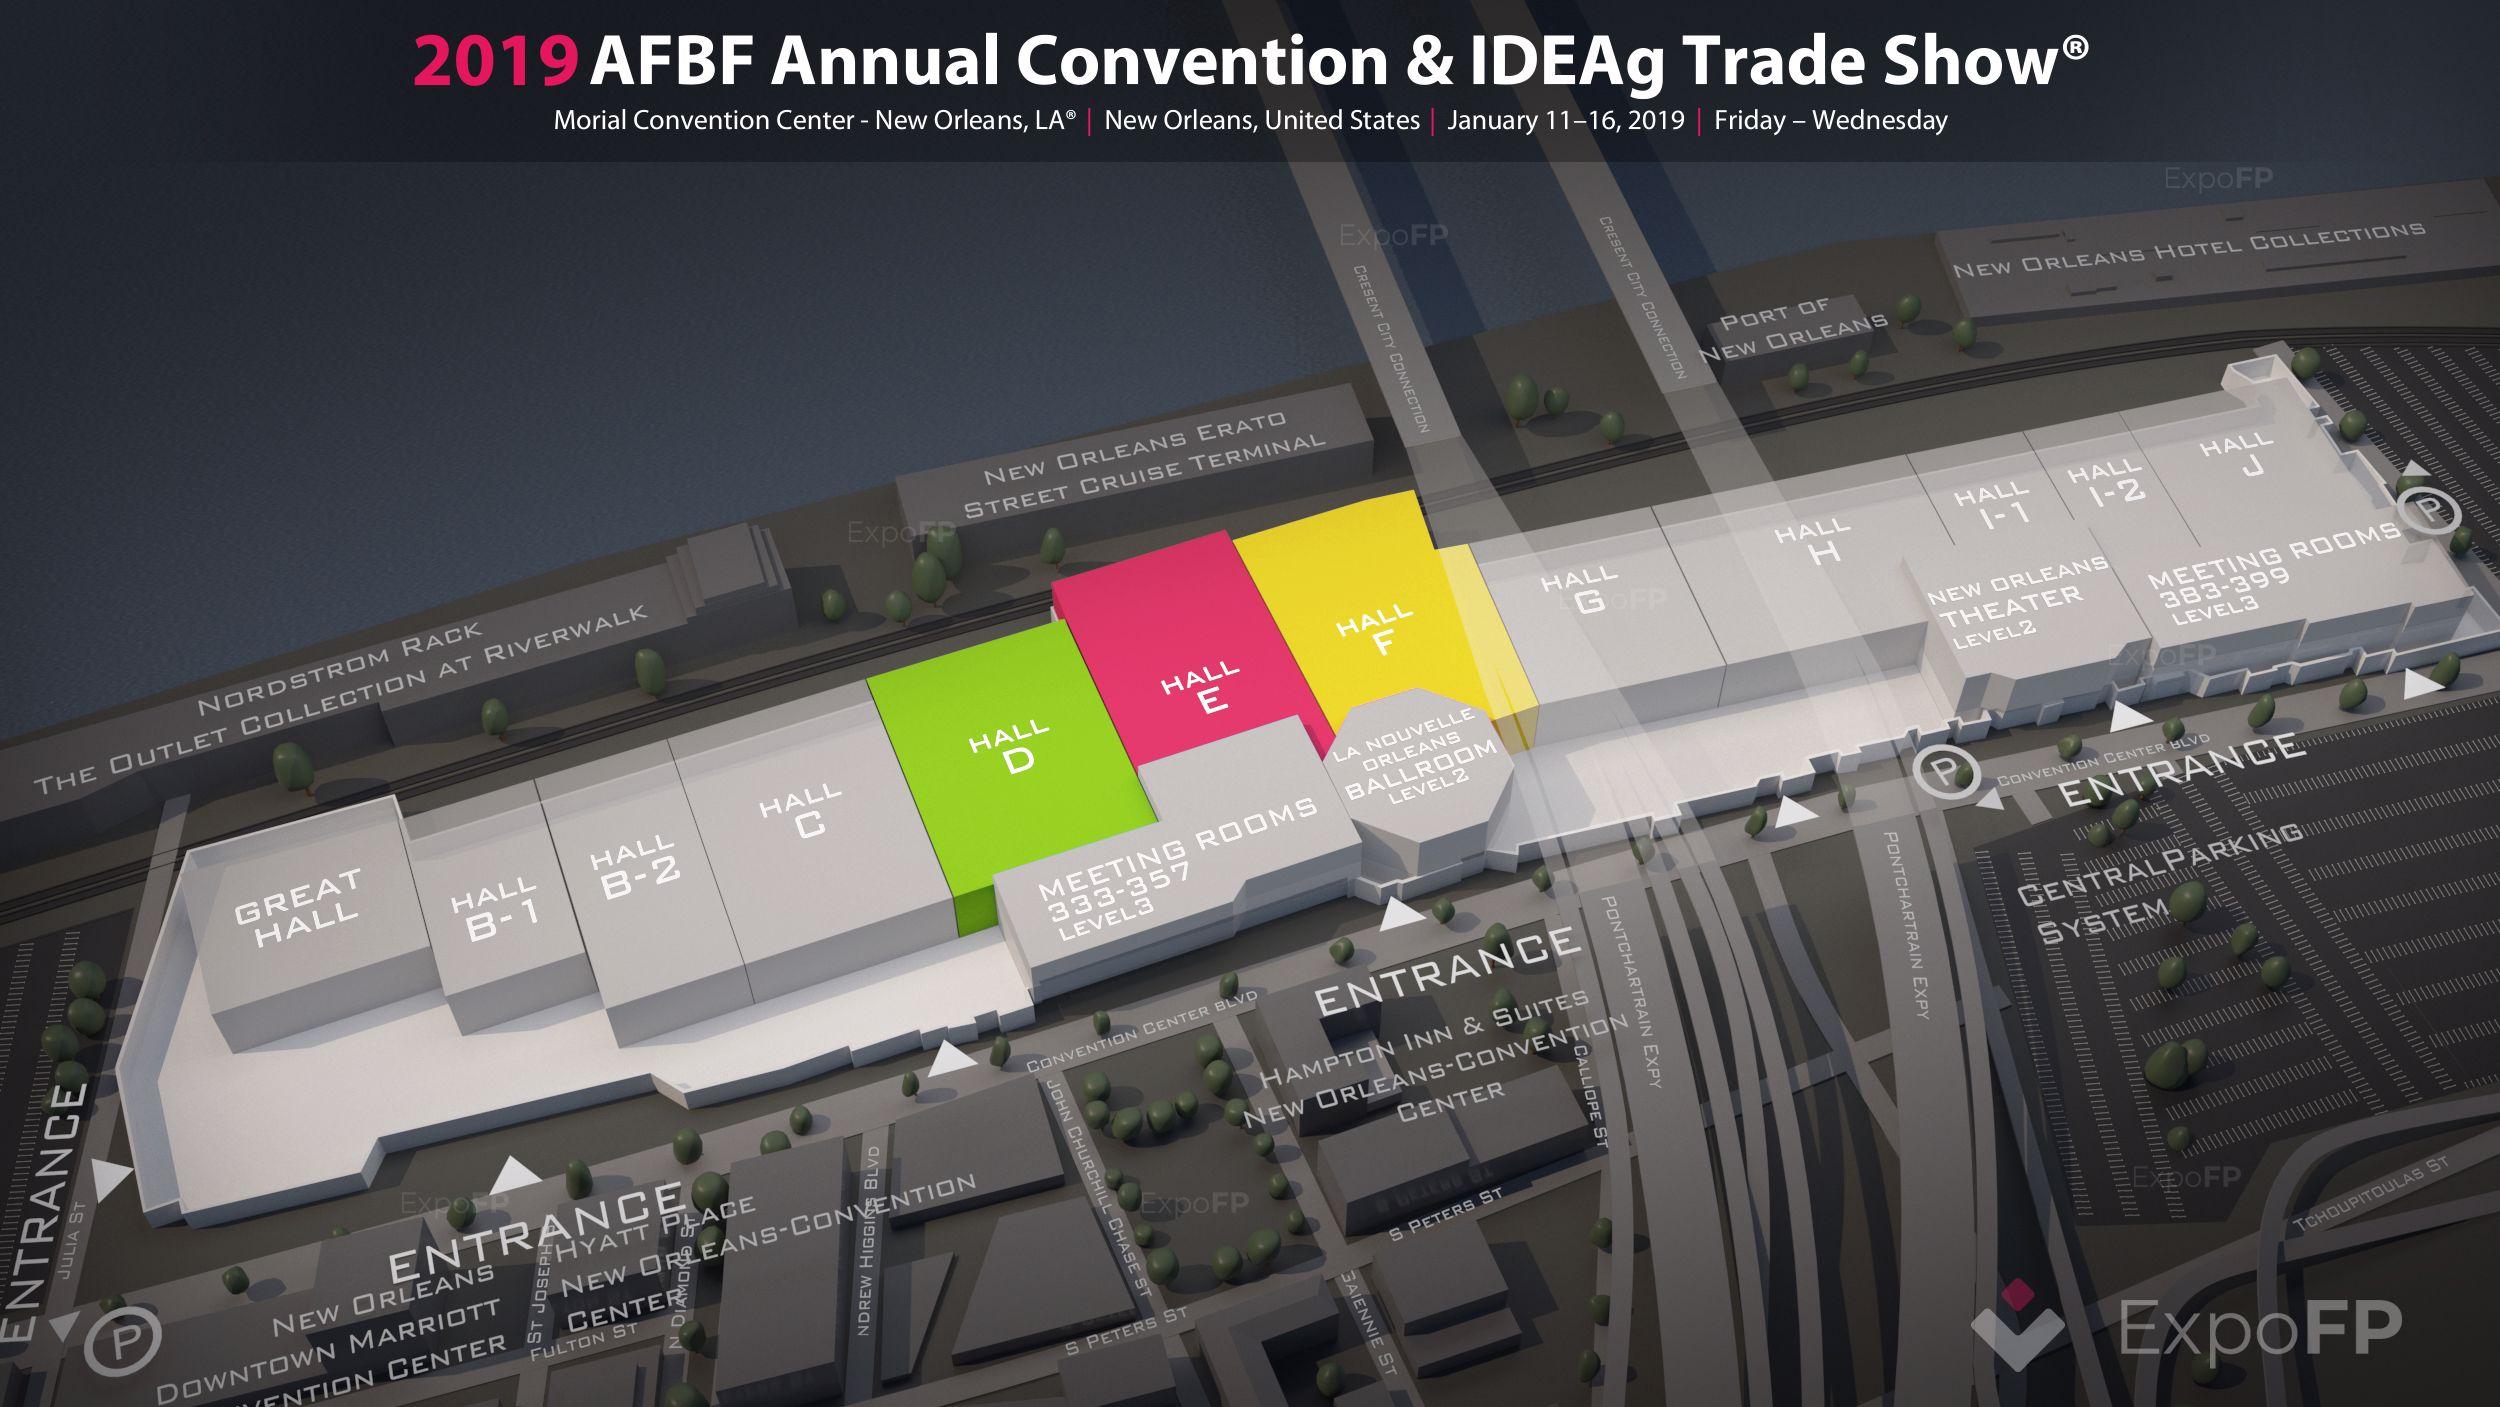 AFBF Annual Convention & IDEAg Trade Show 2019 in Morial